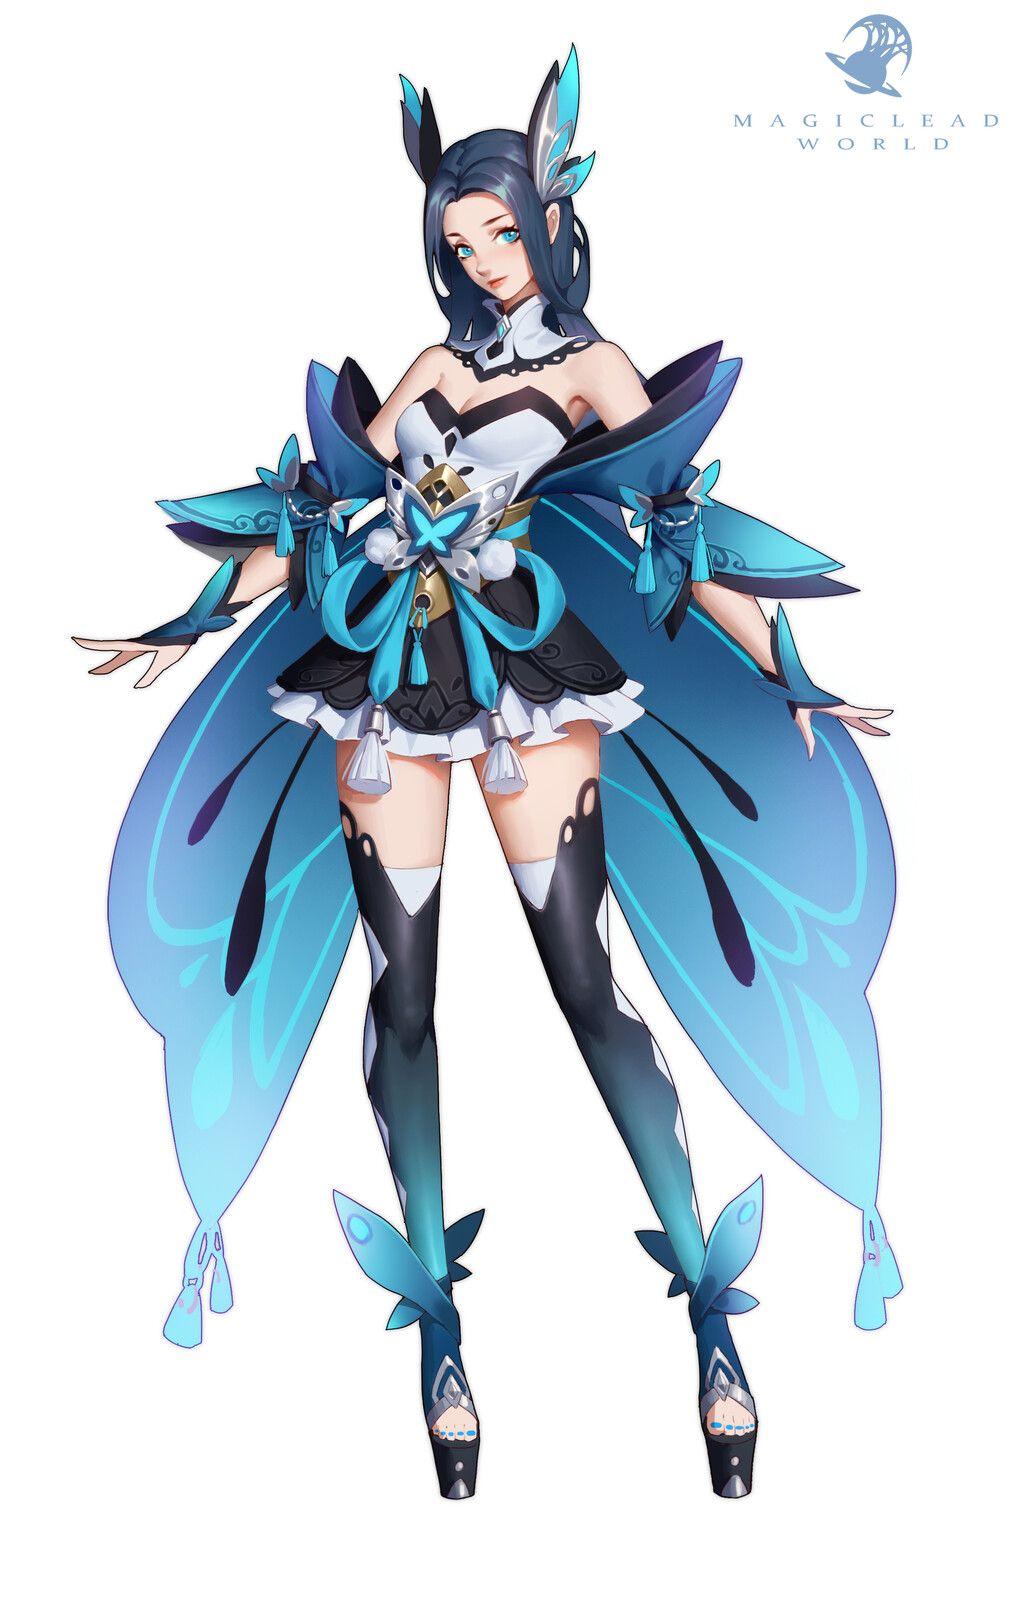 ArtStation 蝶灵, Yu Xiyan in 2020 Character design